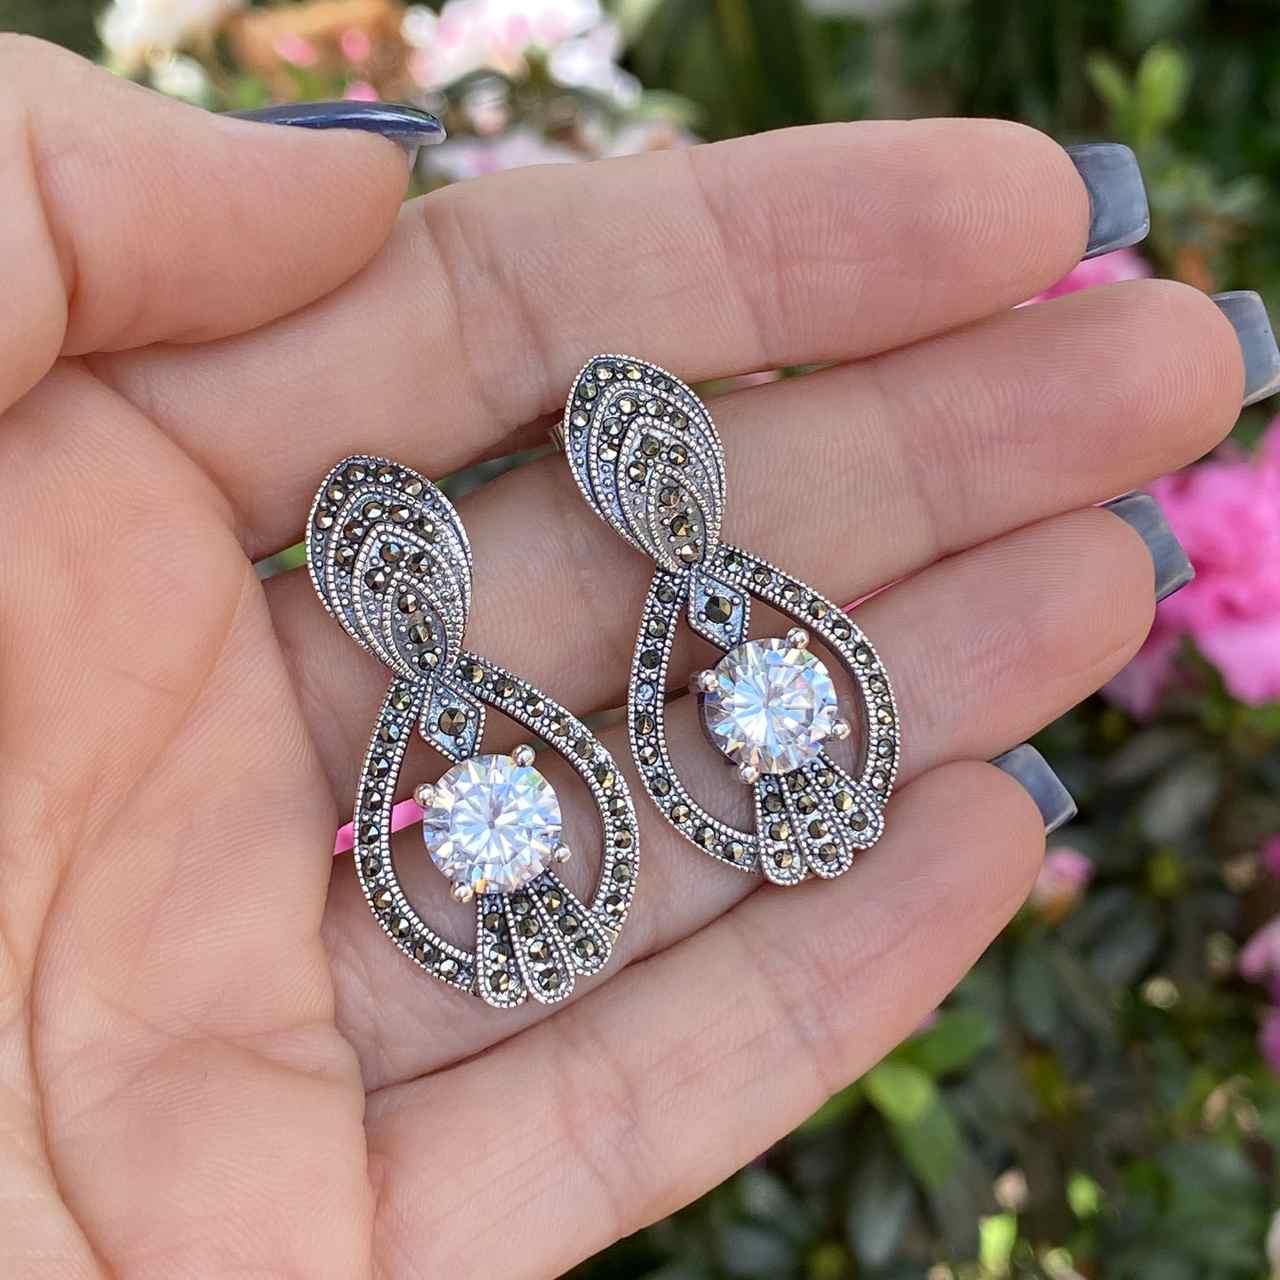 Brinco de Prata 925 Oval Luxo Marcassita e Zircônia Cristal